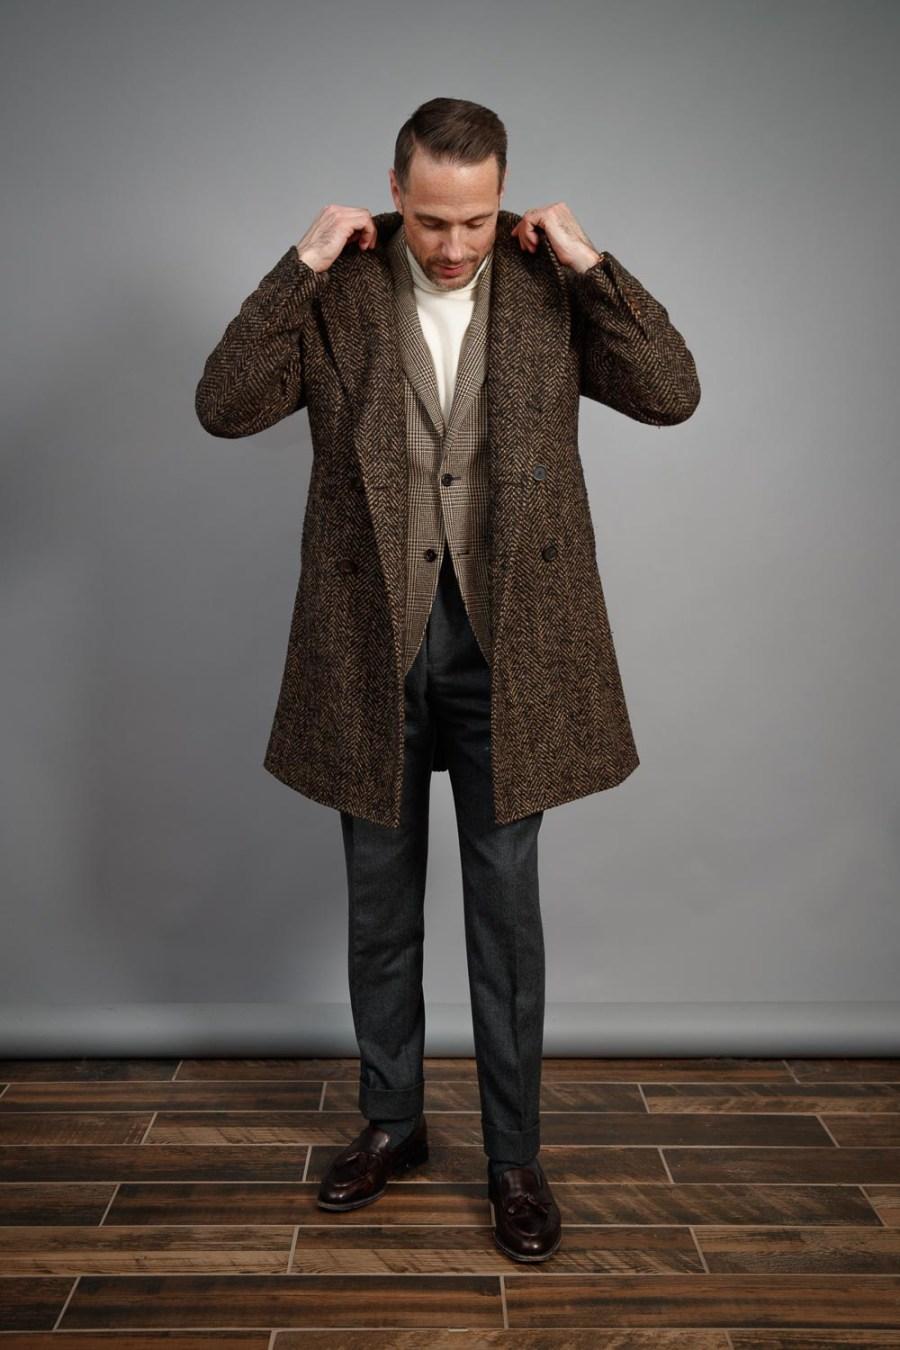 best-flannel-suit-ideas-for-men-turtleneck-and-overcoat-suede-tassel-loafers